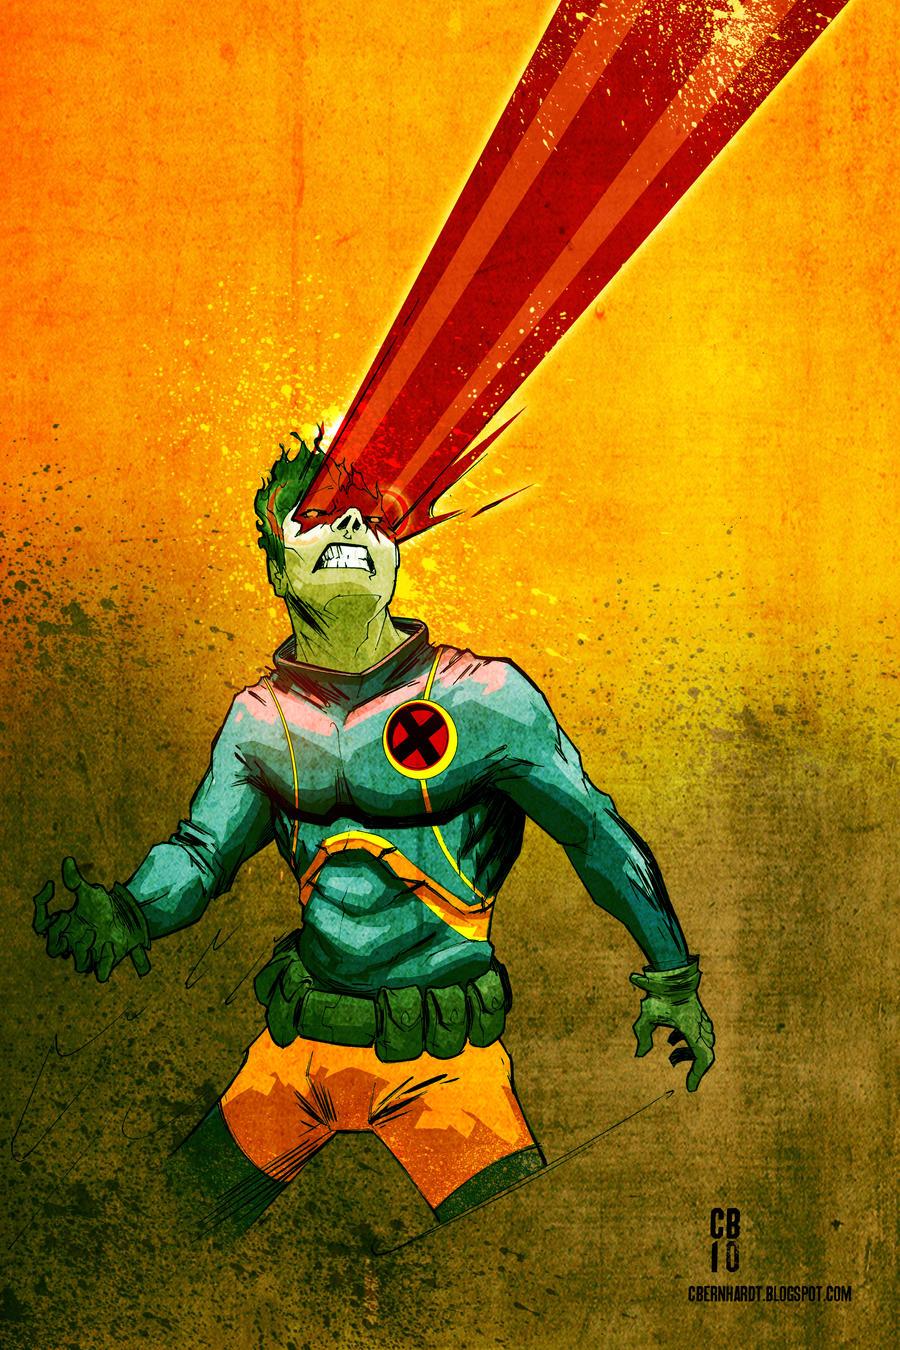 Cyclops by cbernhardt